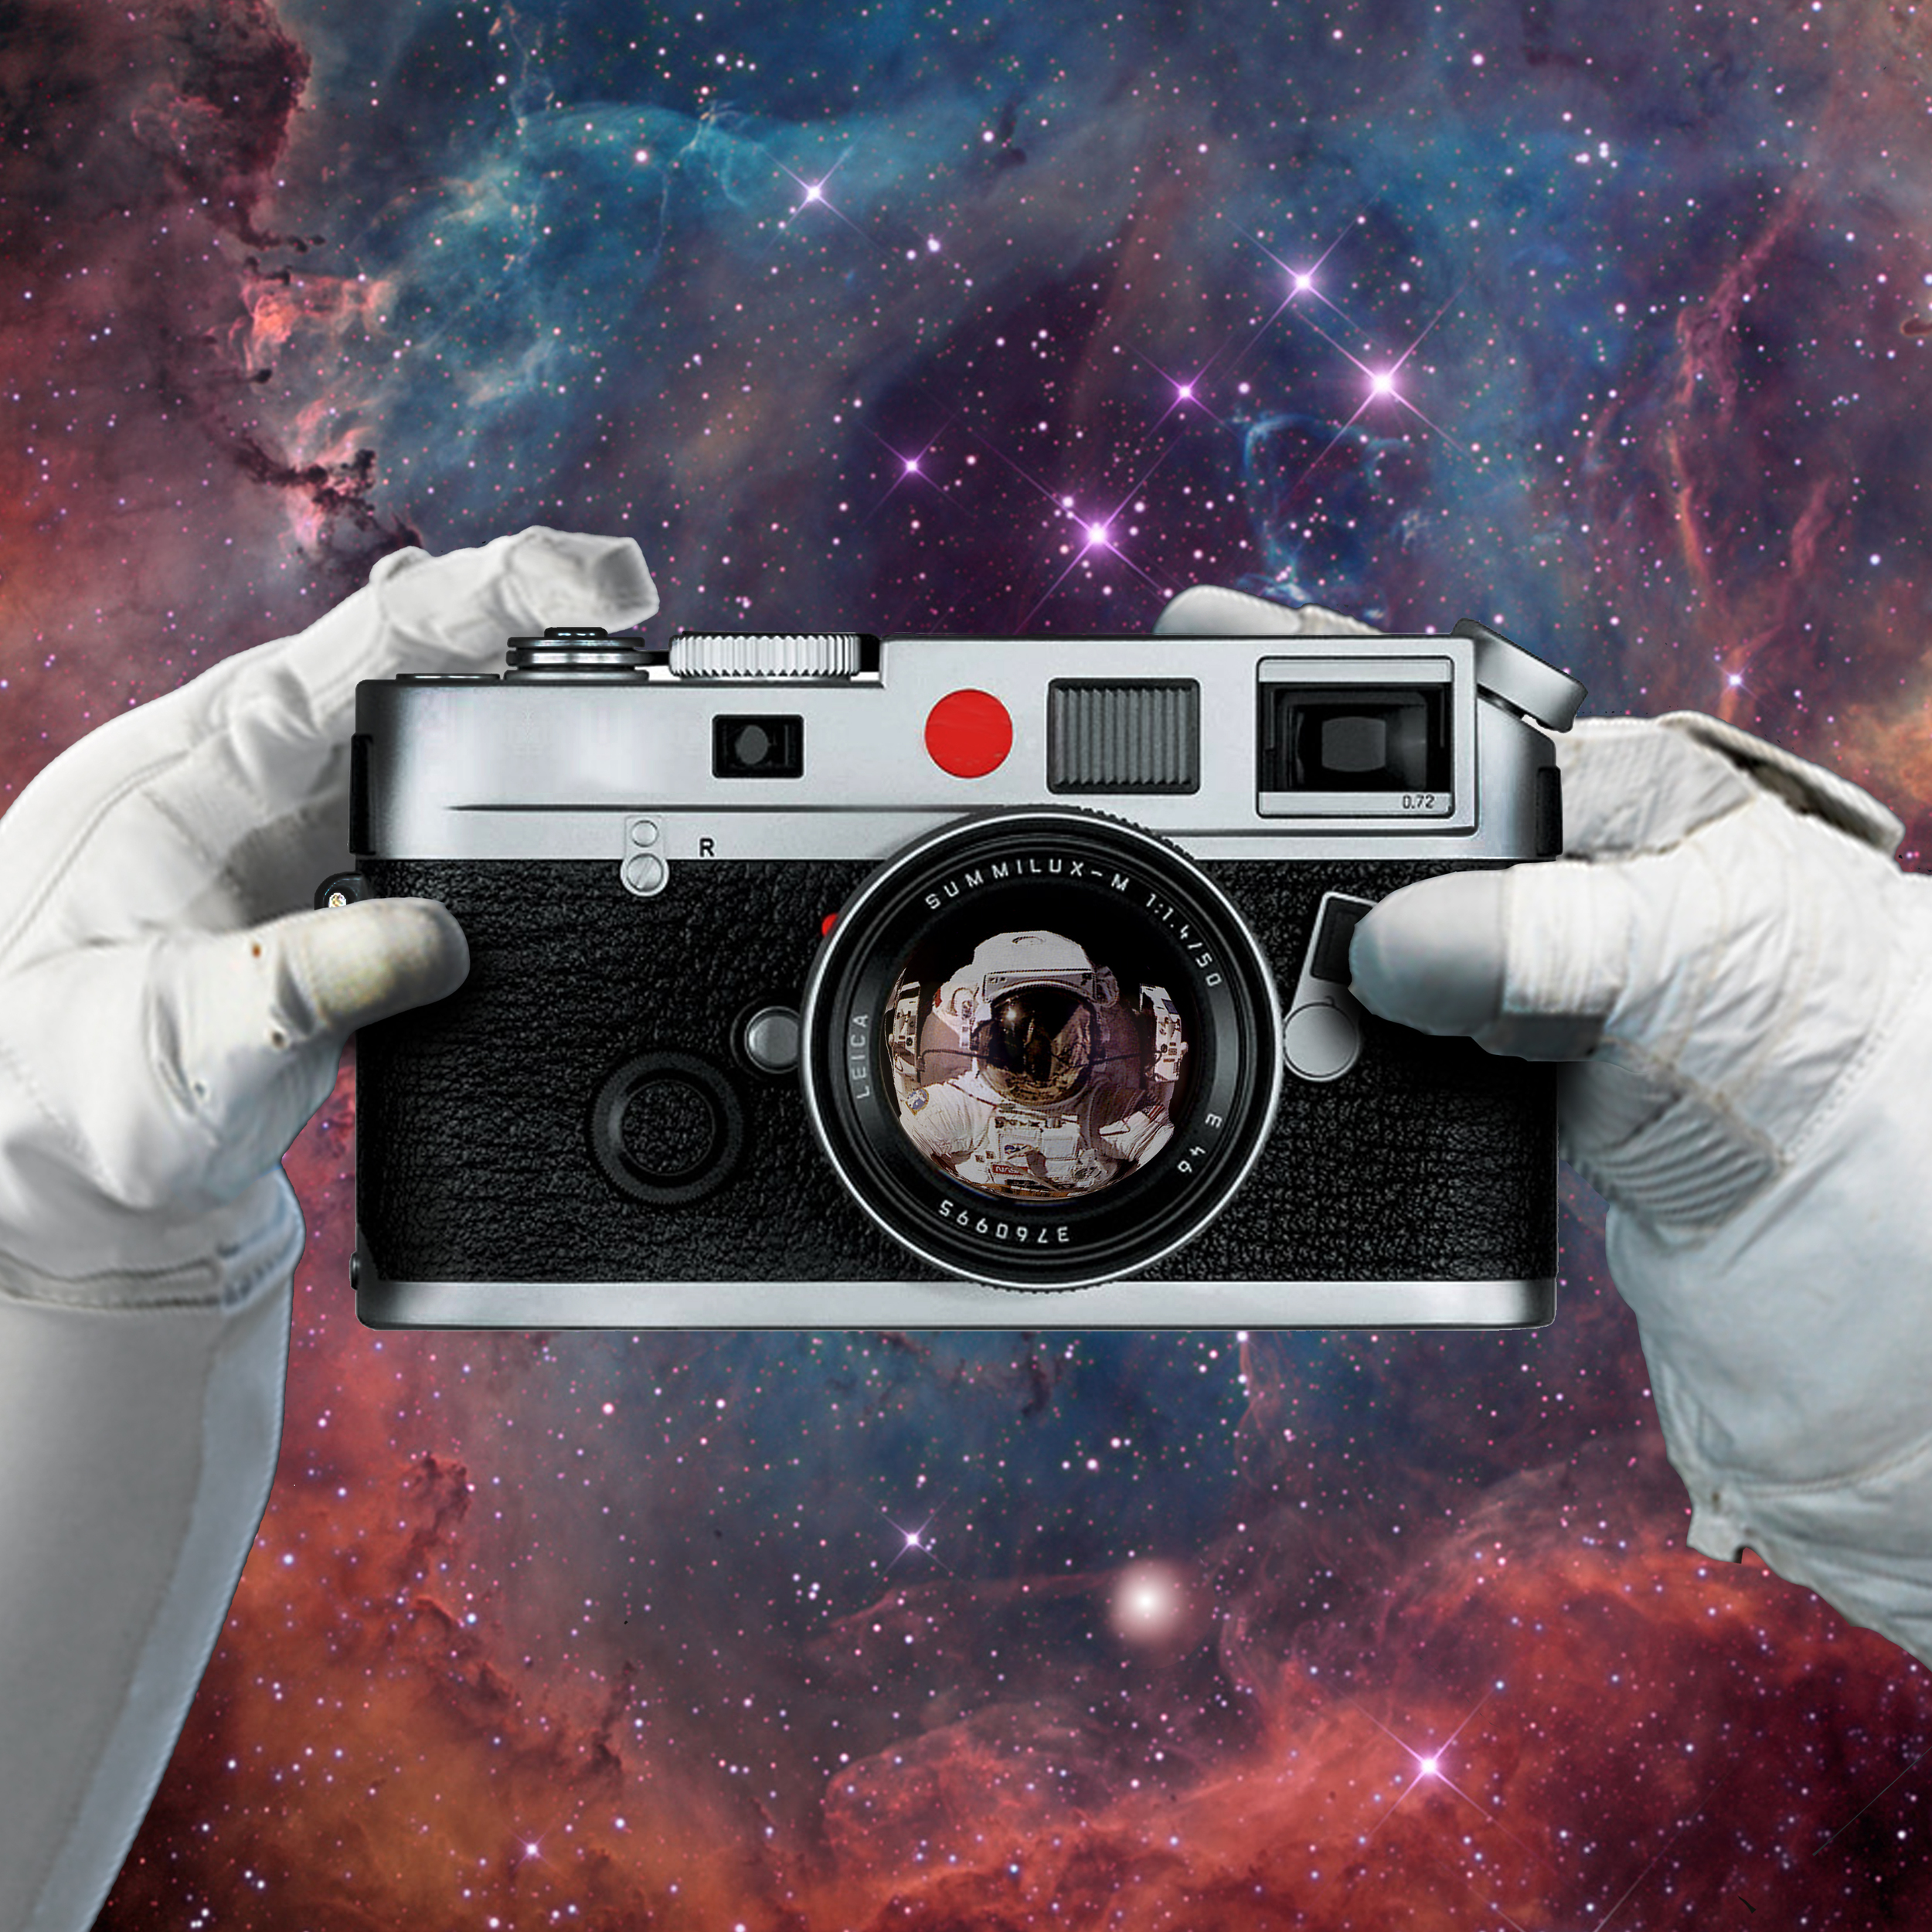 Astronaut Selfi